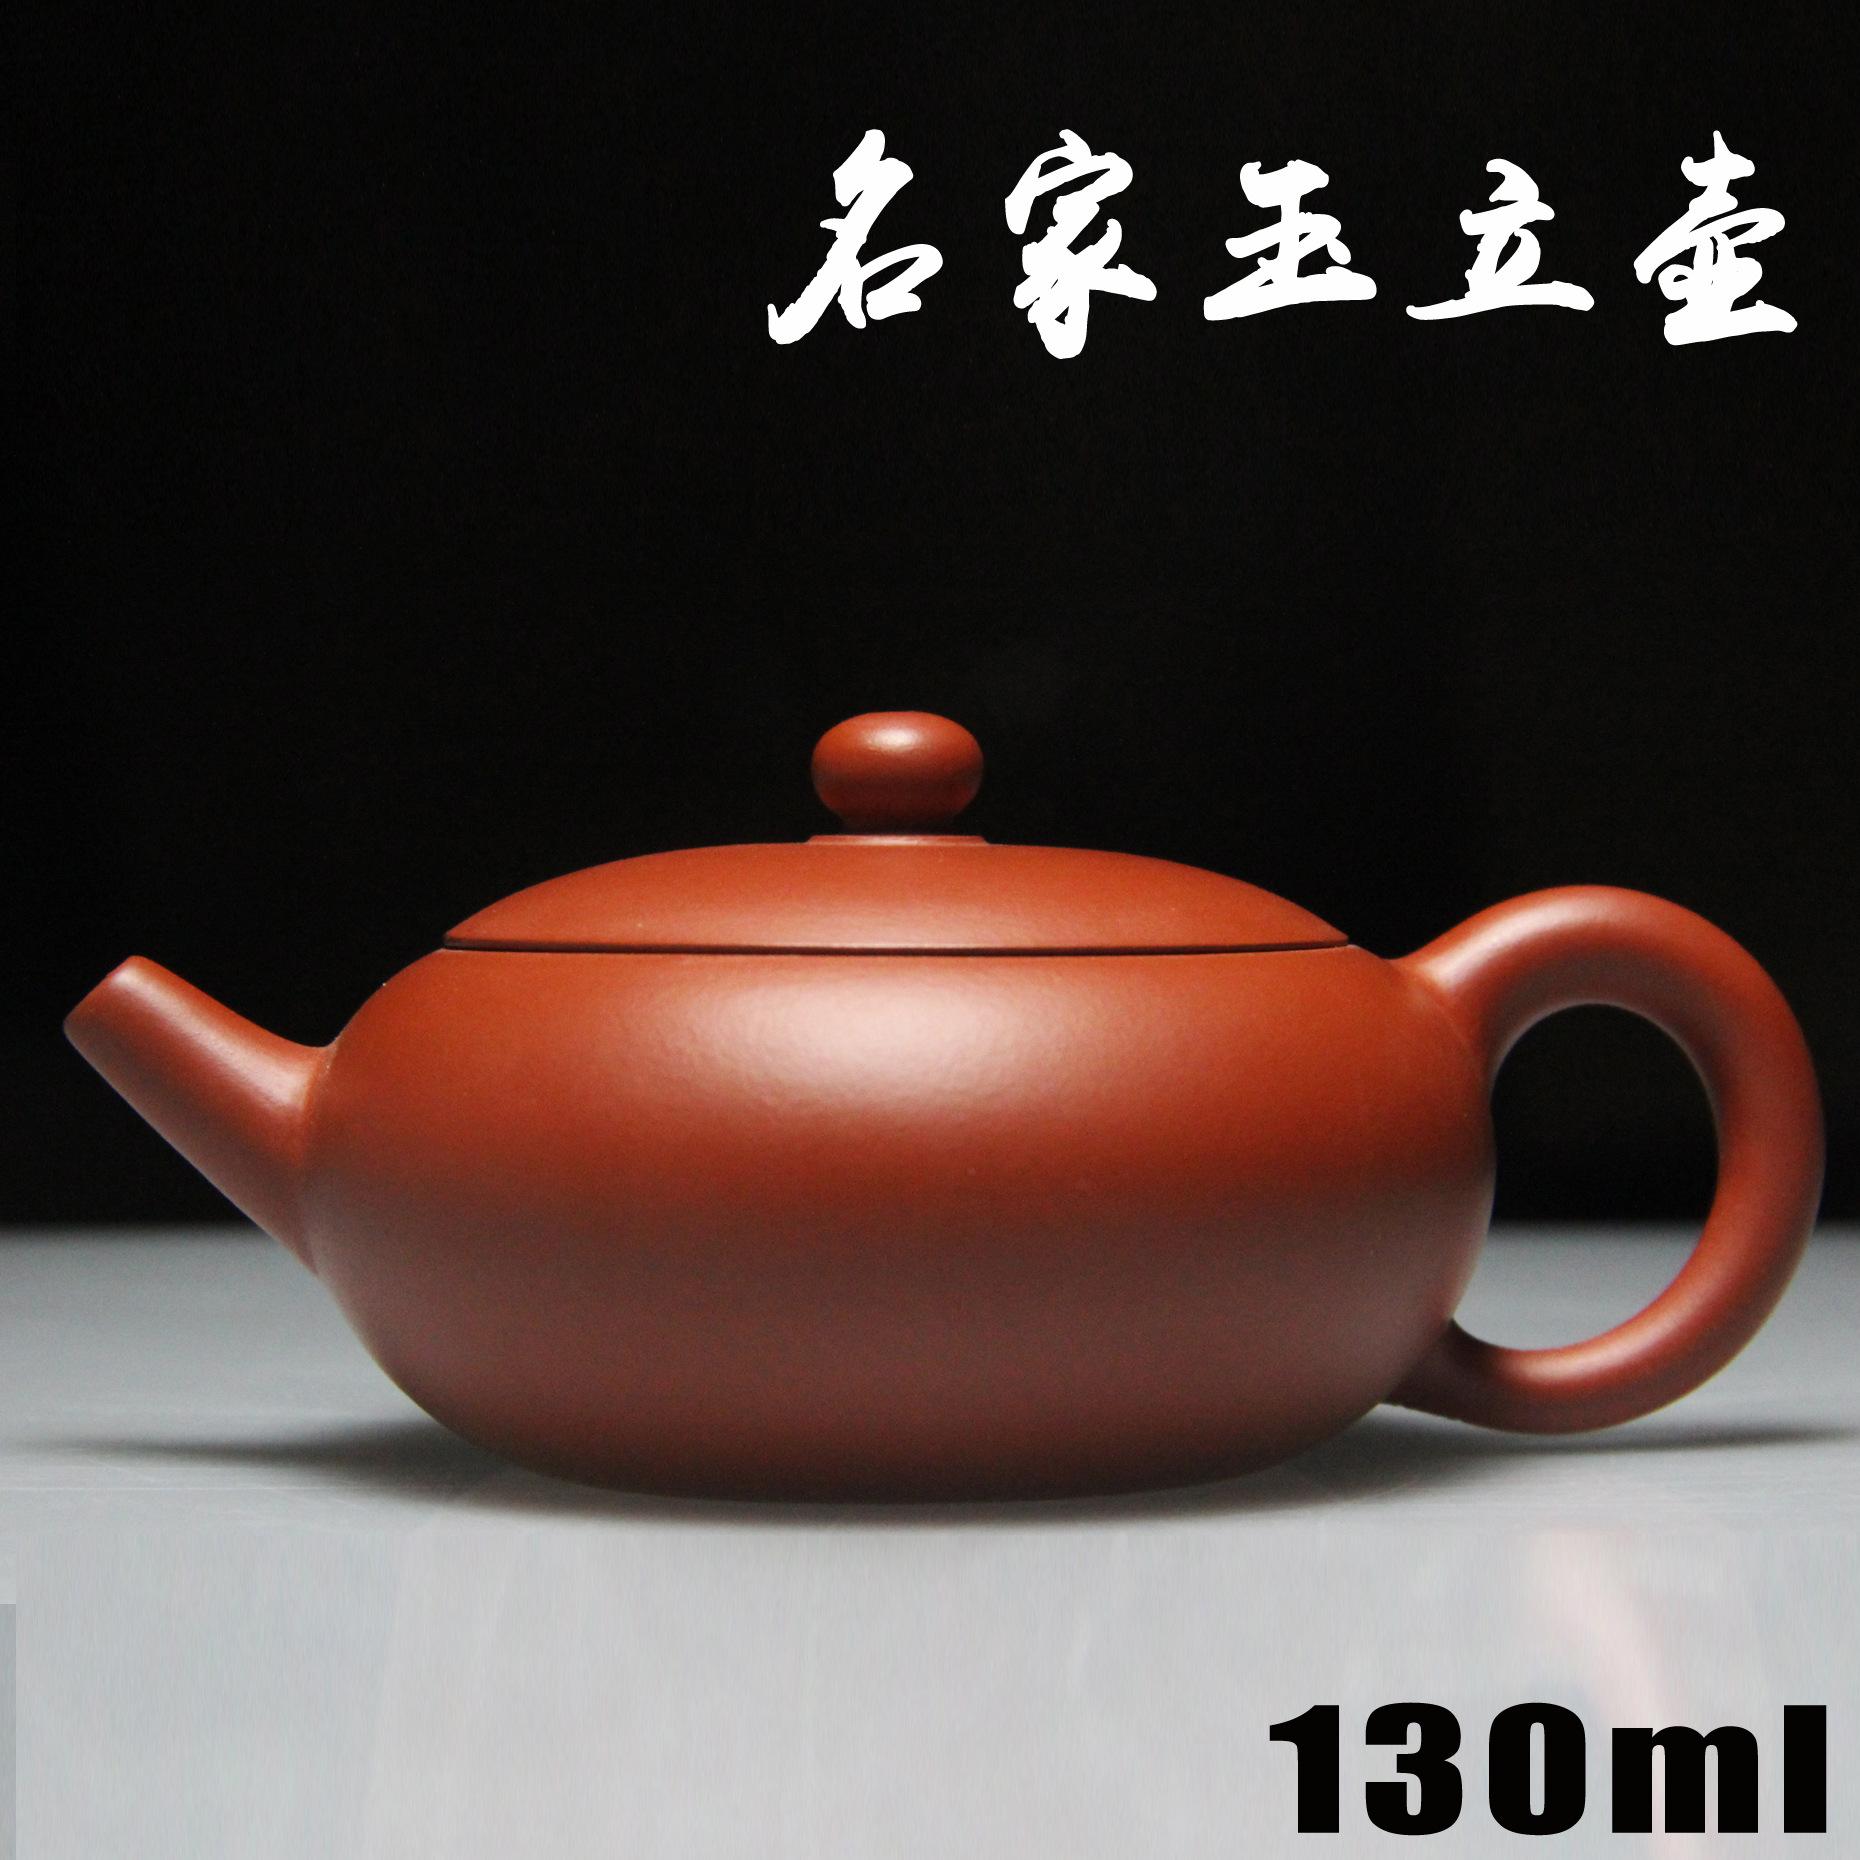 130CC Authentic Tea Pot Zisha Masters Handmade Teapot Mud Ore Red Purple Clay Chinese Kung Fu Kettle With Gift Box(China (Mainland))